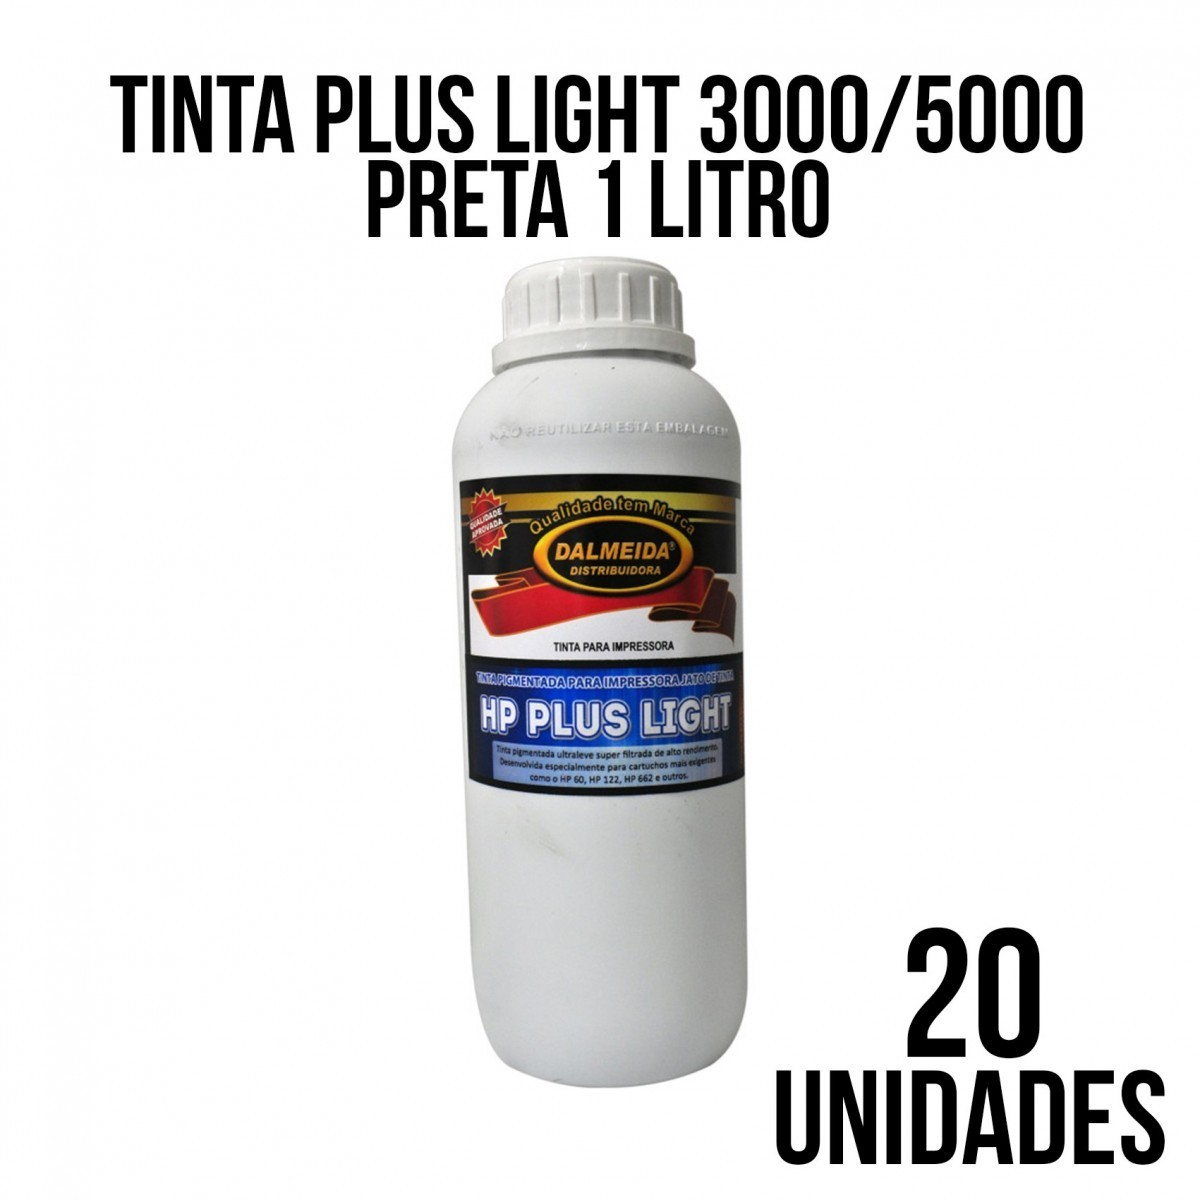 TINTA PLUS LIGHT 3000/5000 PRETA -COMBO COM 20 UNIDADES